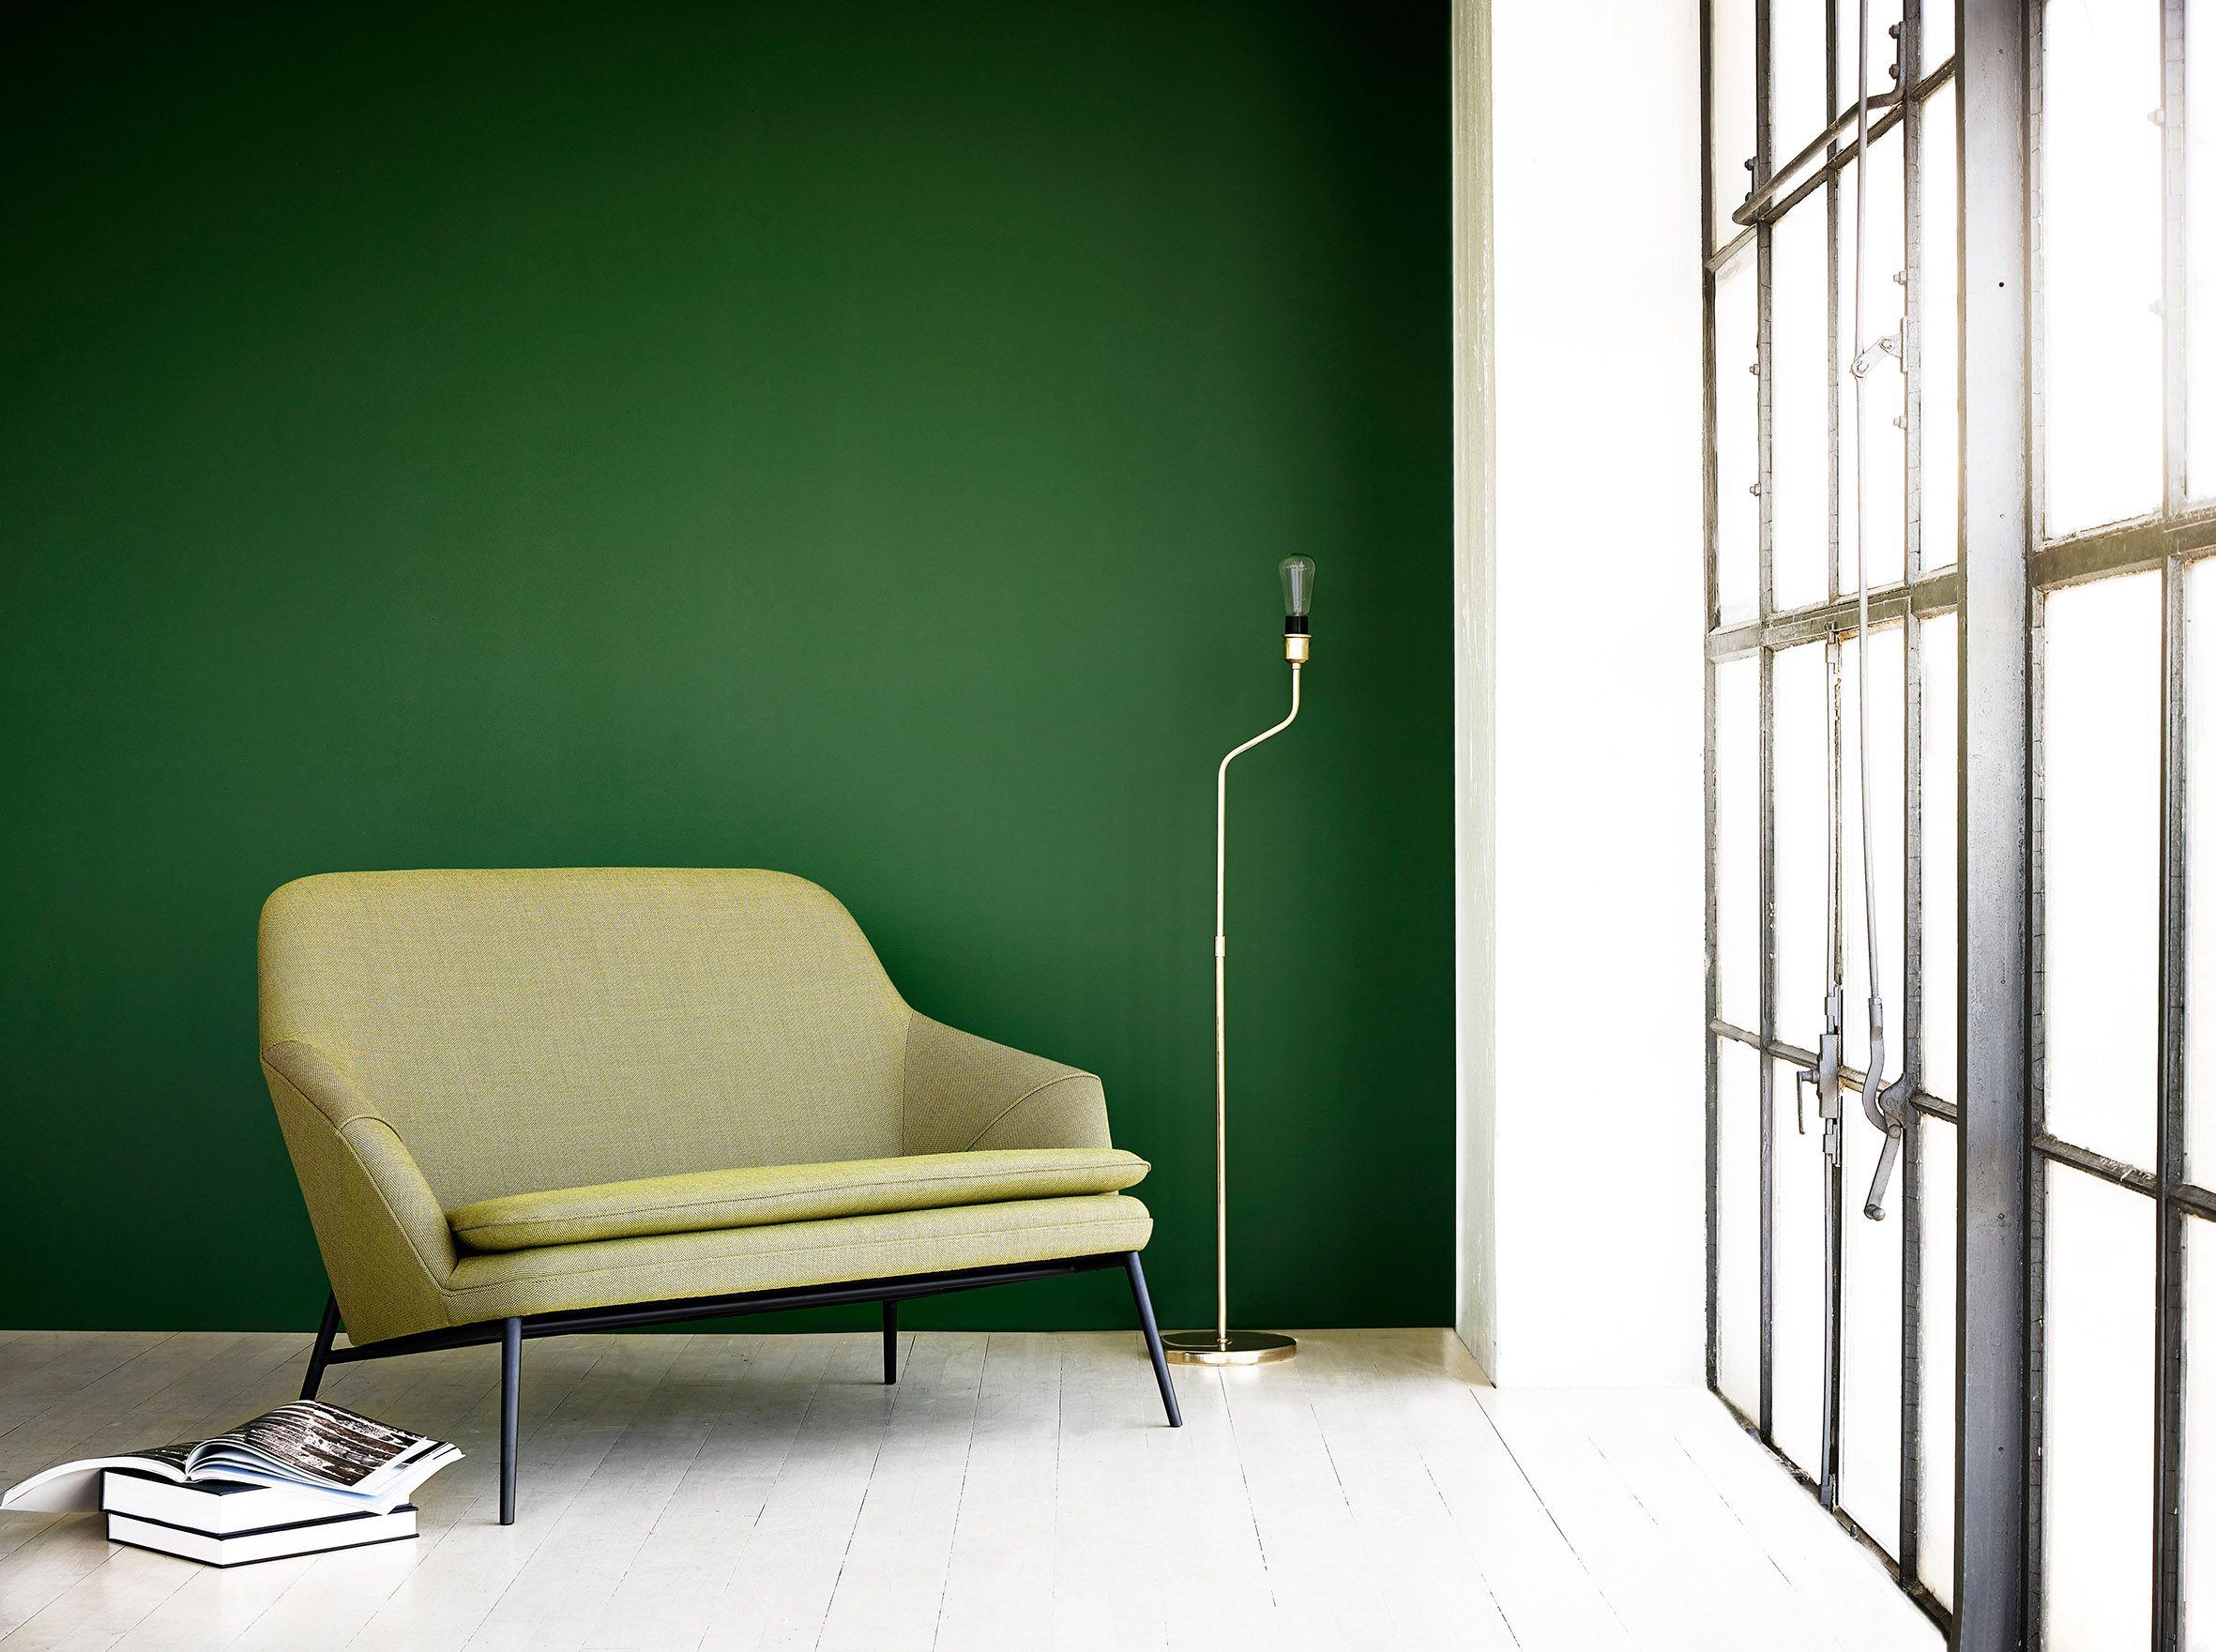 Hug, Sofa, Wendelbo, Design, Danish Design, 365 North, Henrik Pedersen